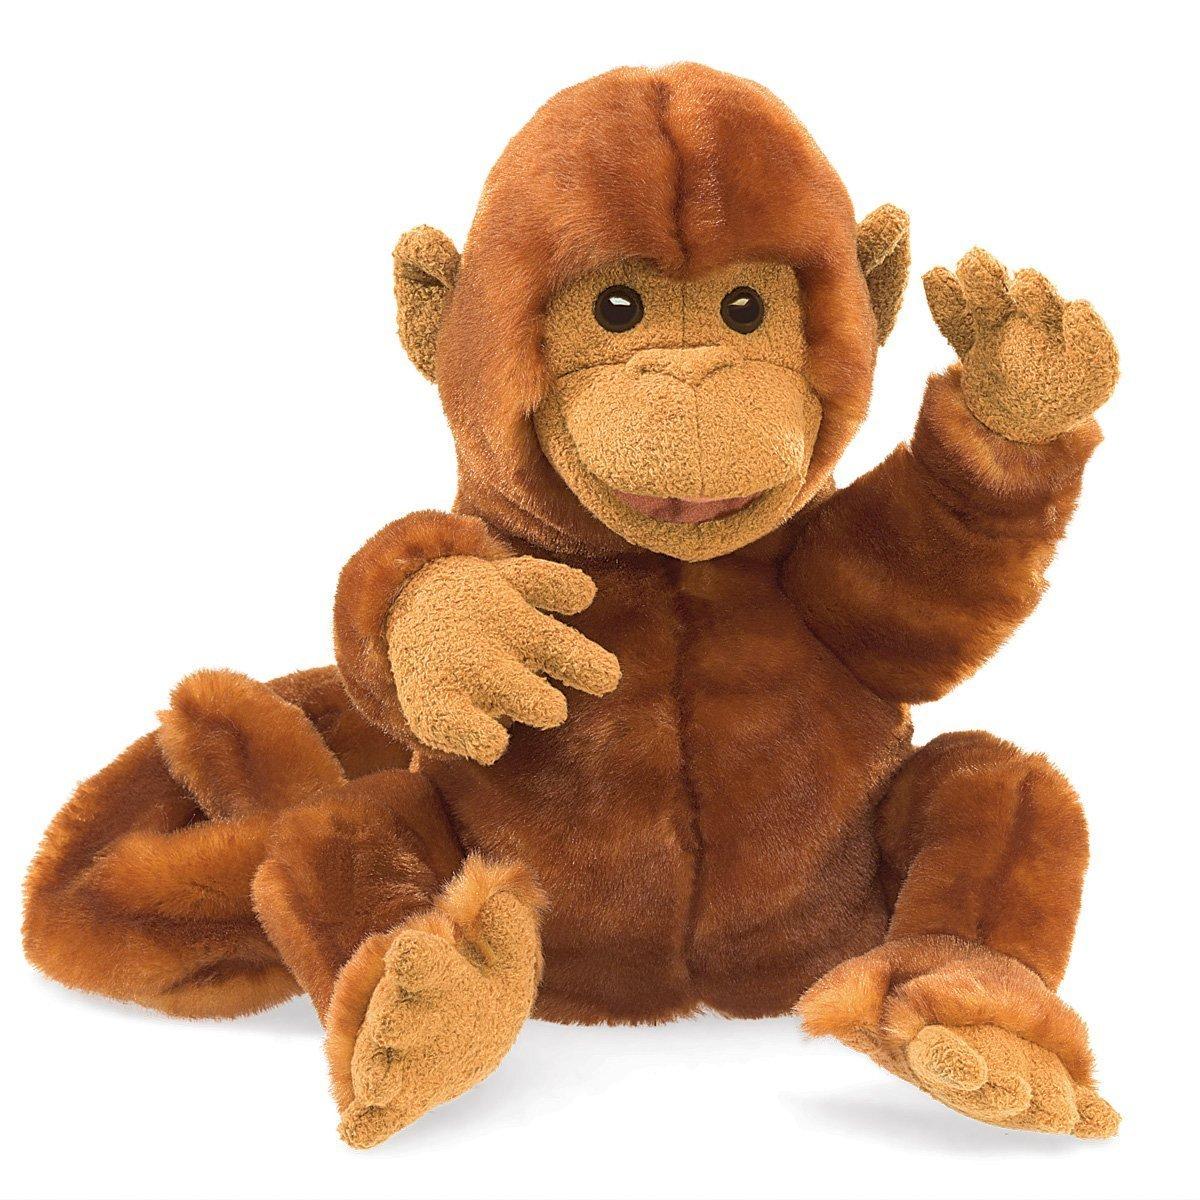 Folkmanis Hand Puppet - Classic Monkey image